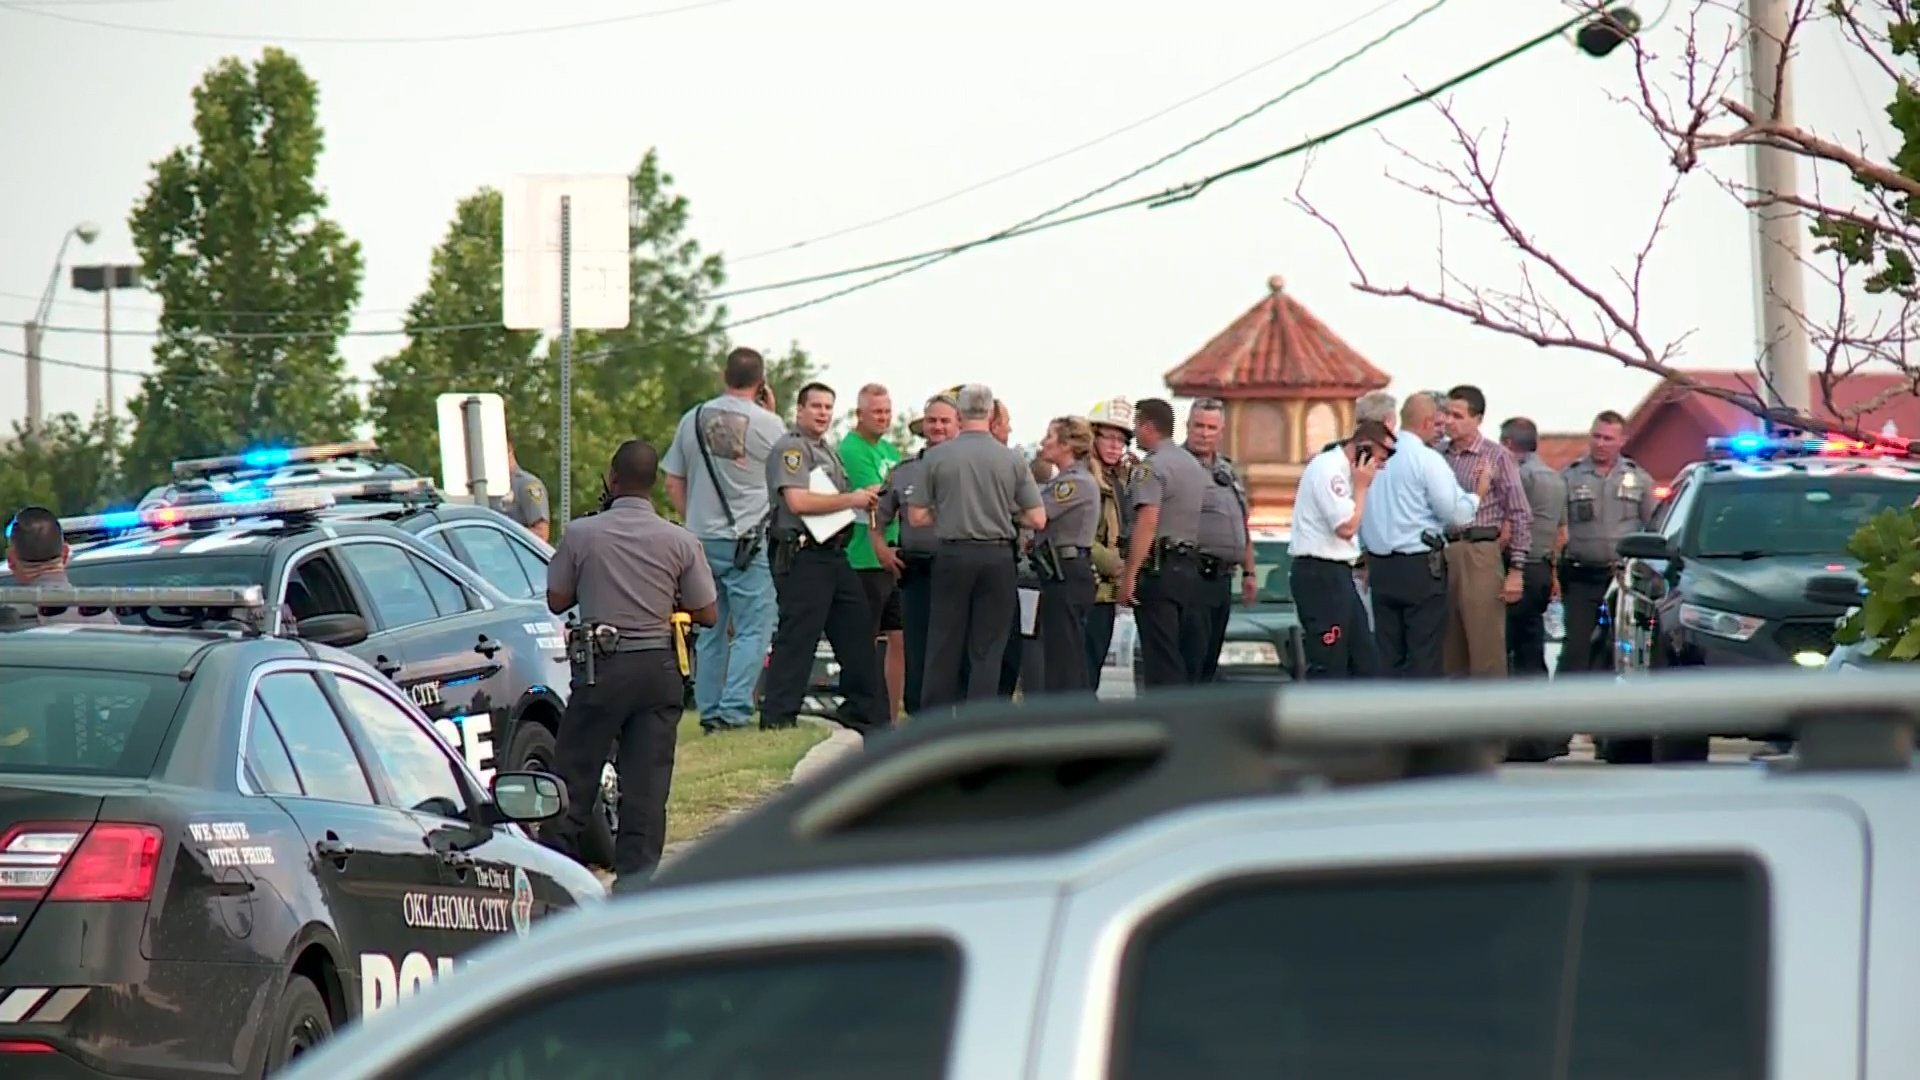 Police in Oklahoma City investigate a shooting on May 24, 2018, at a restaurant in Oklahoma City, Oklahoma. (Credit: KFOR via CNN)